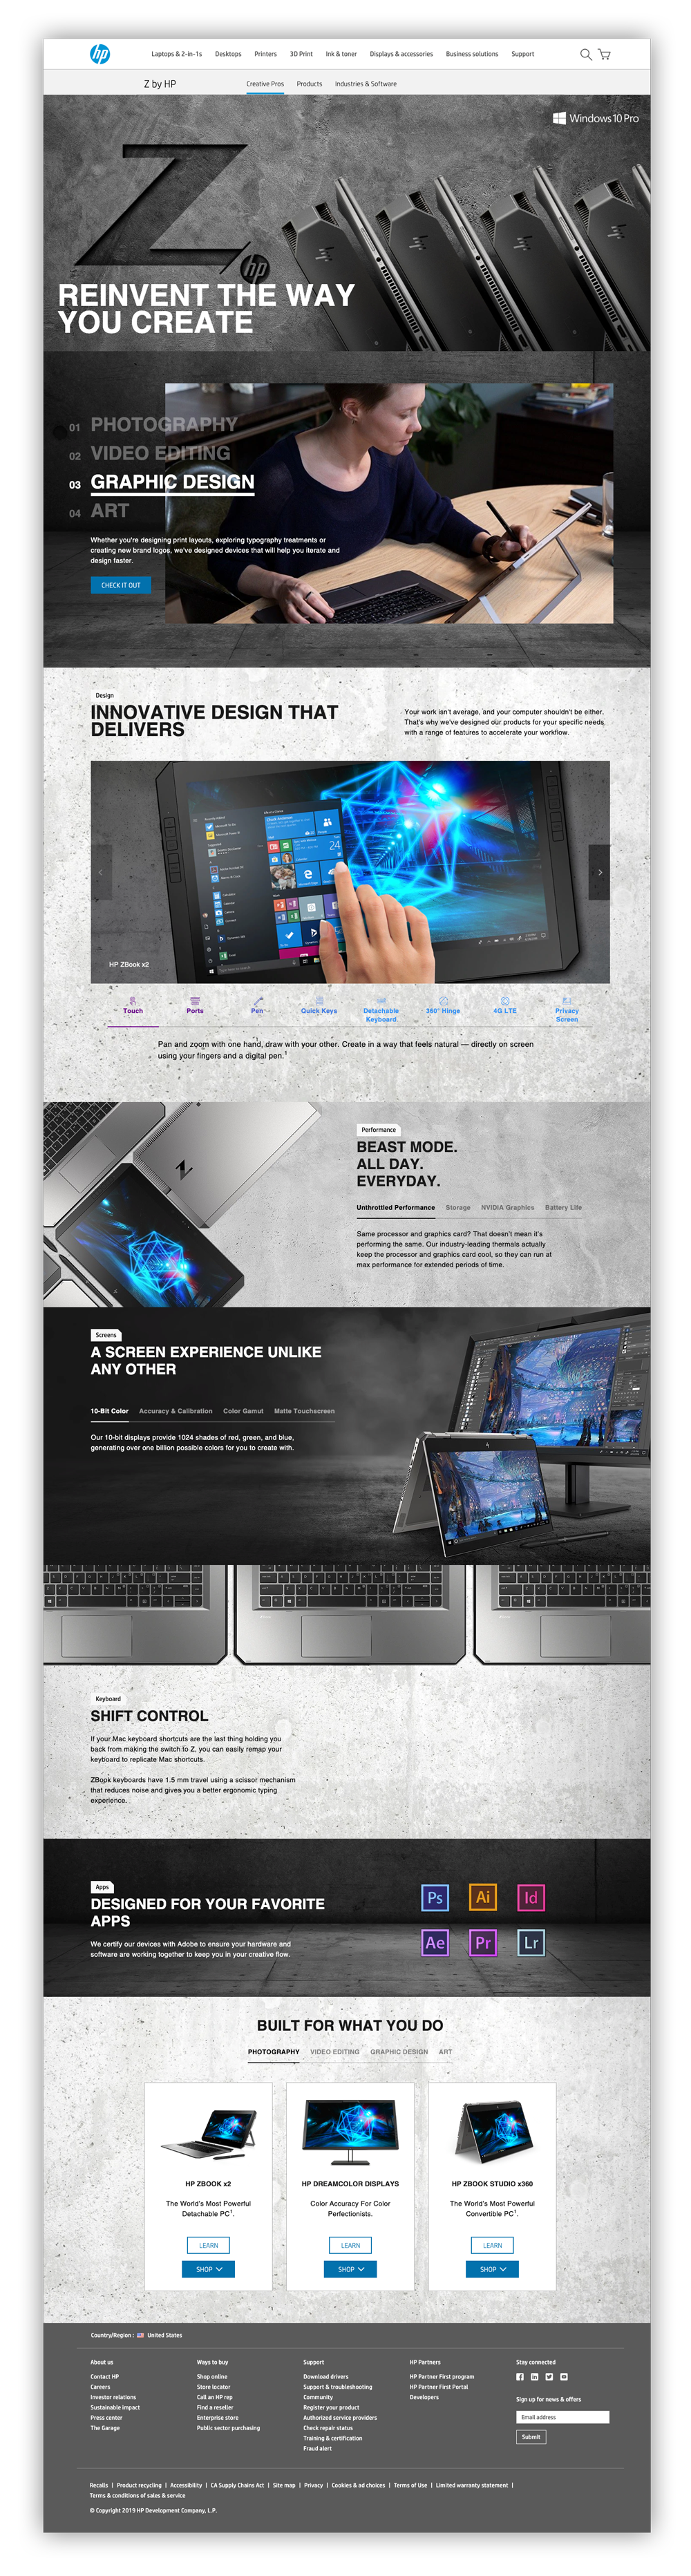 CreativePros_LandingPage_1.png